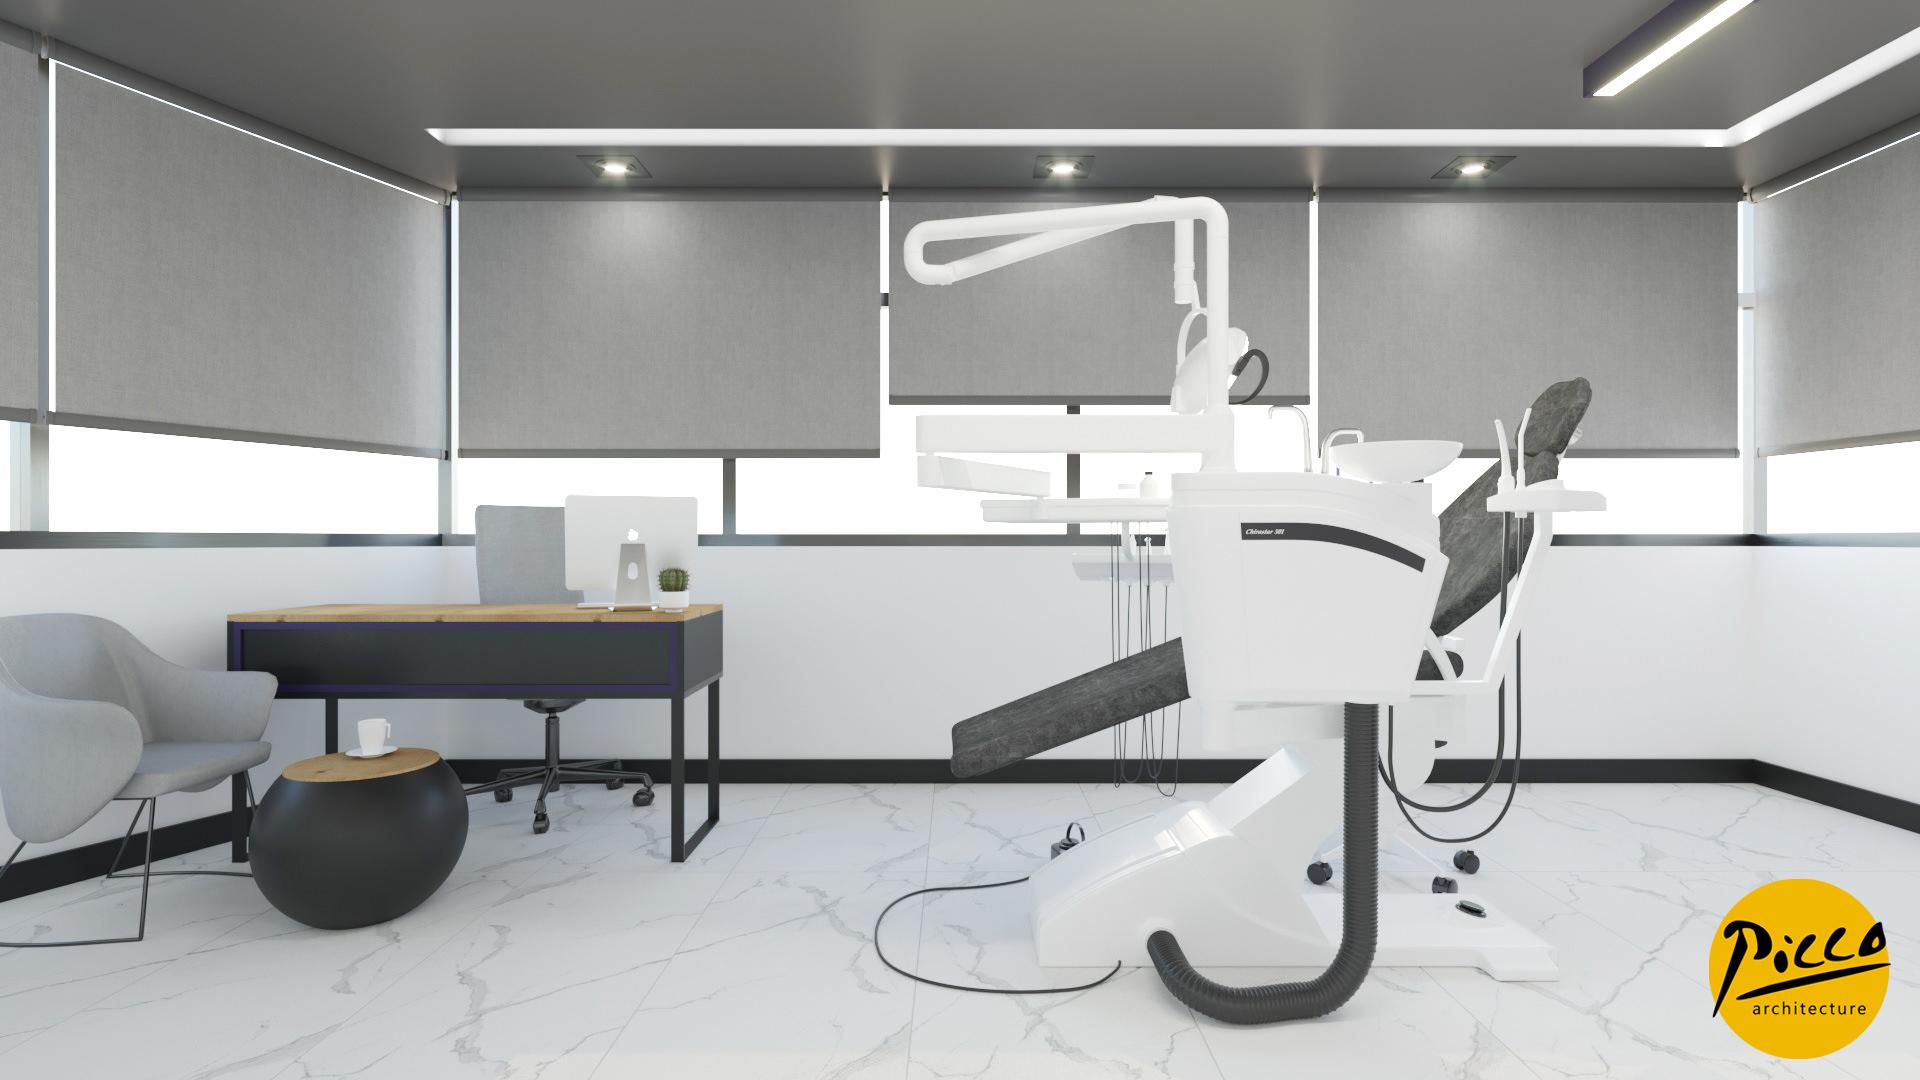 Alanya_Dis_Hekimi_Ezgi_Celik_Ezgi_Dental_House_tasarim